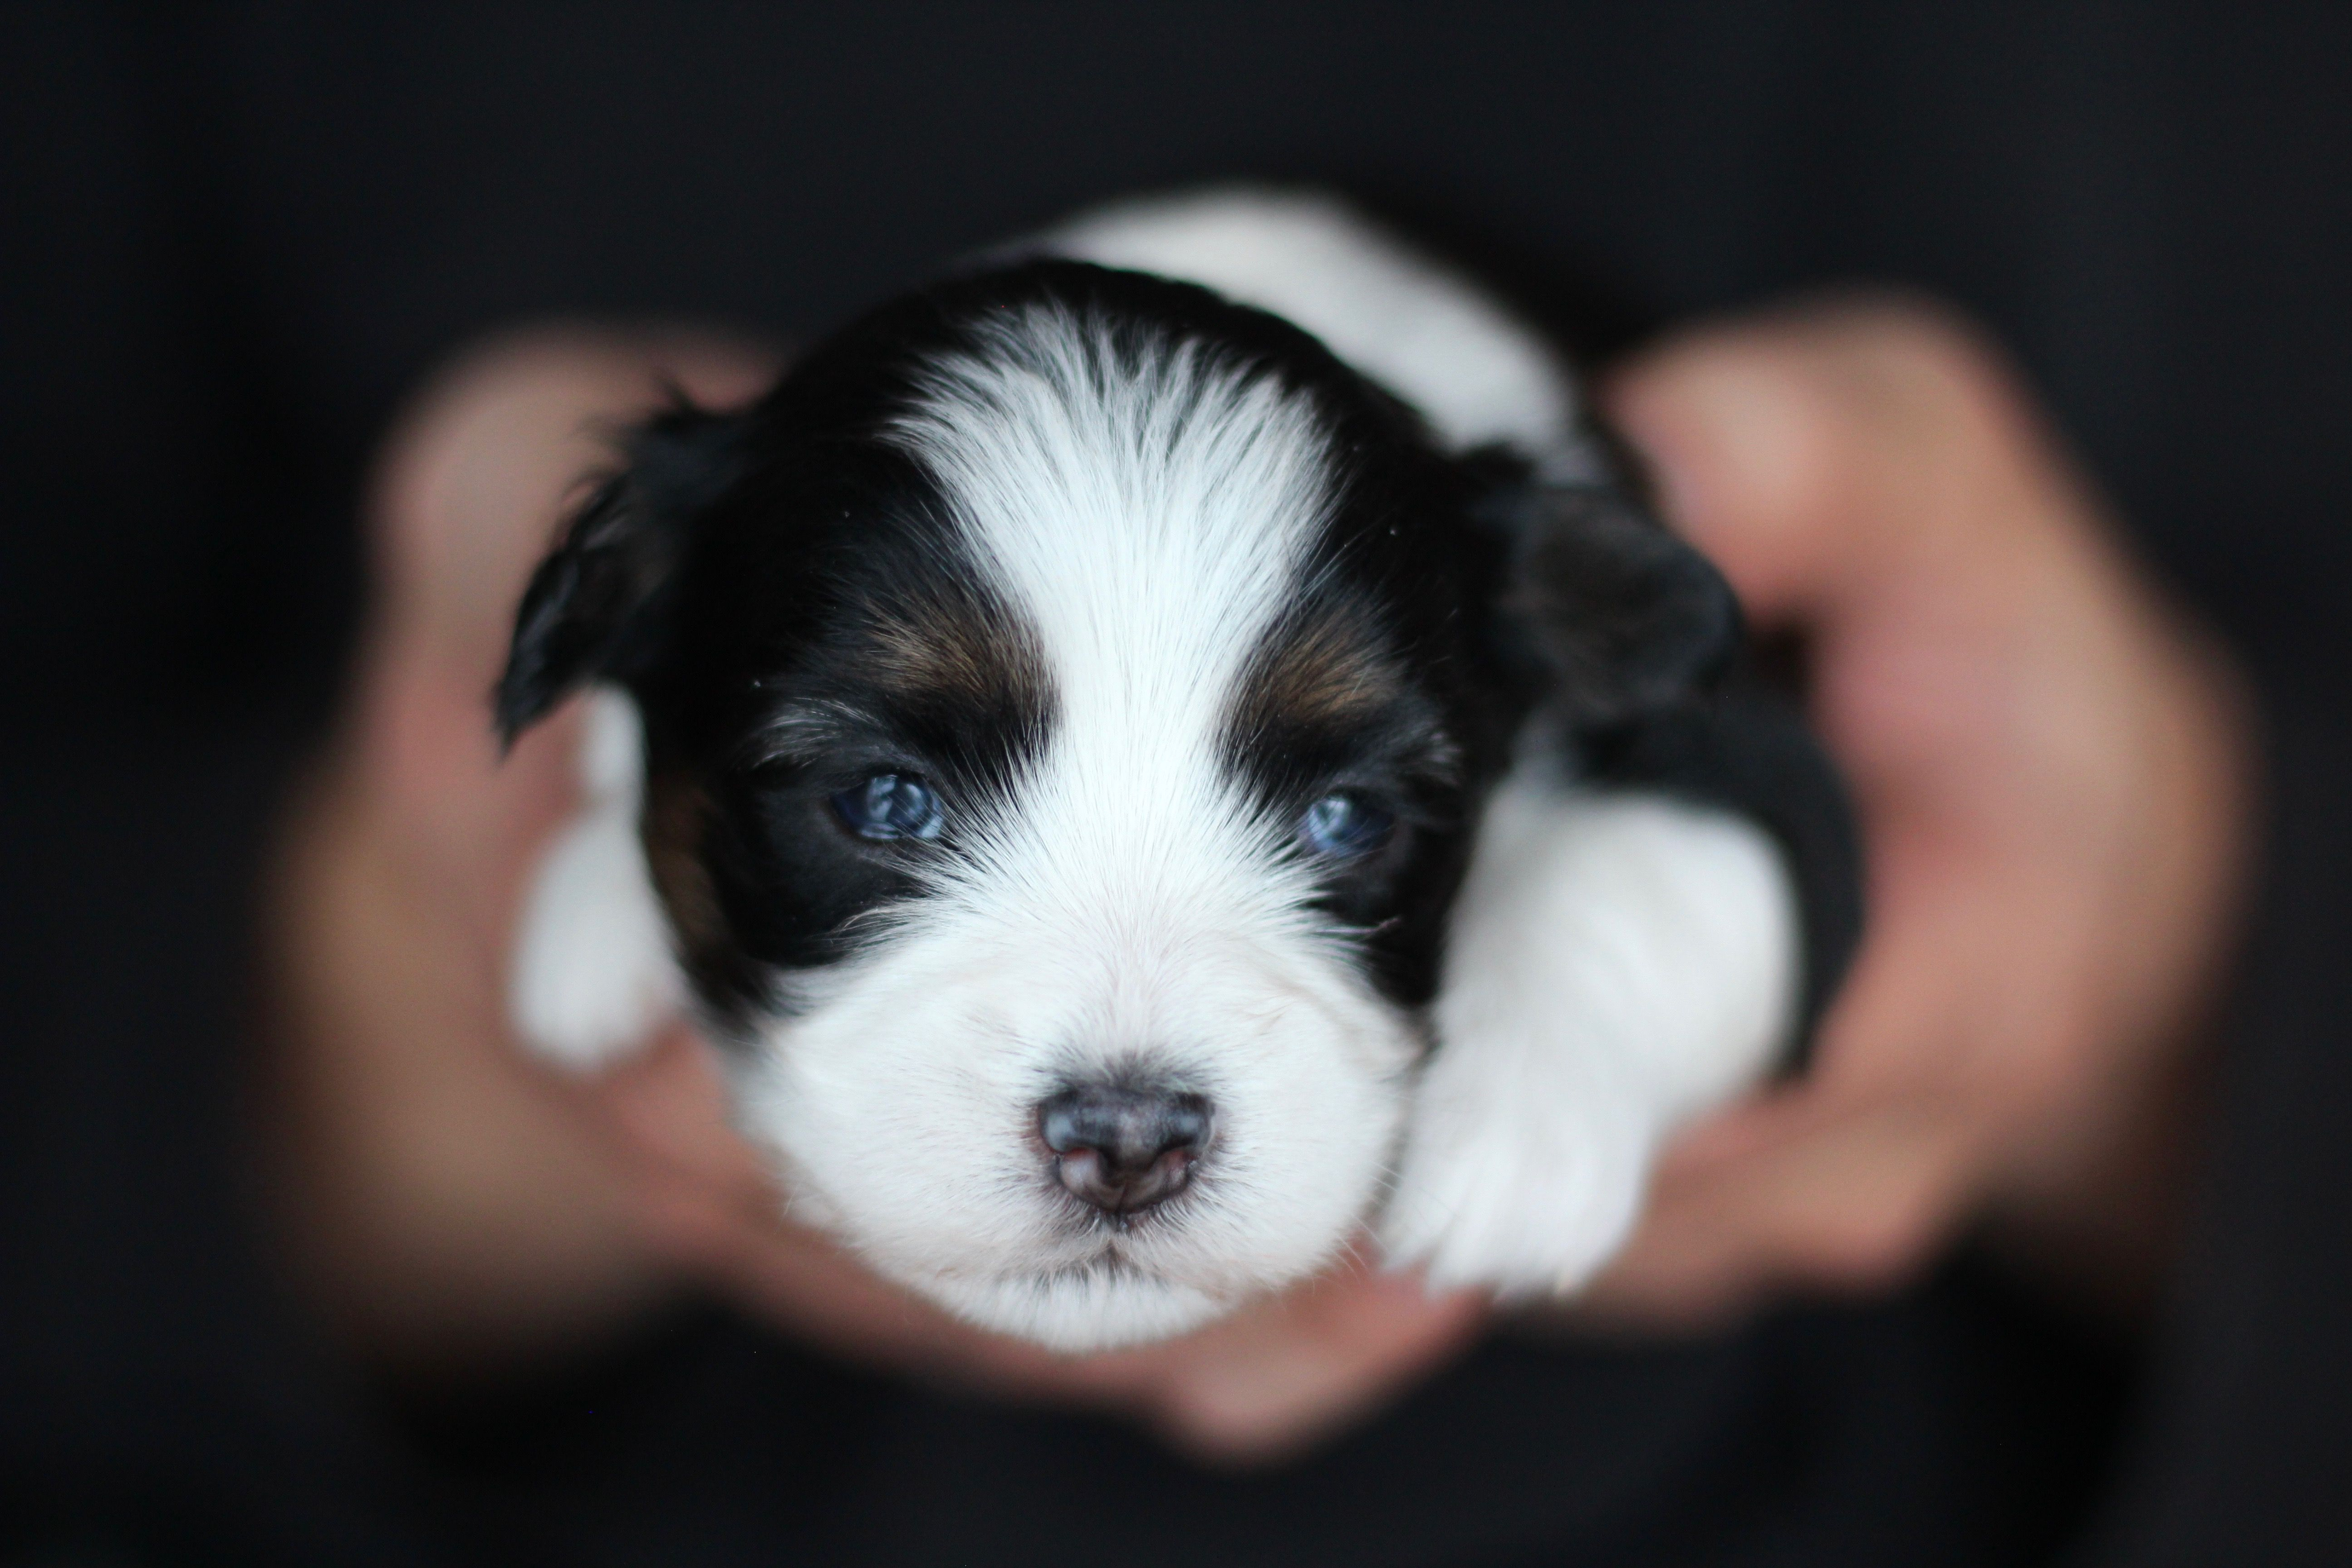 Bichon Shih Tzu Puppy Babybarks Ca Shih Tzu Puppy Bichon Shih Tzu